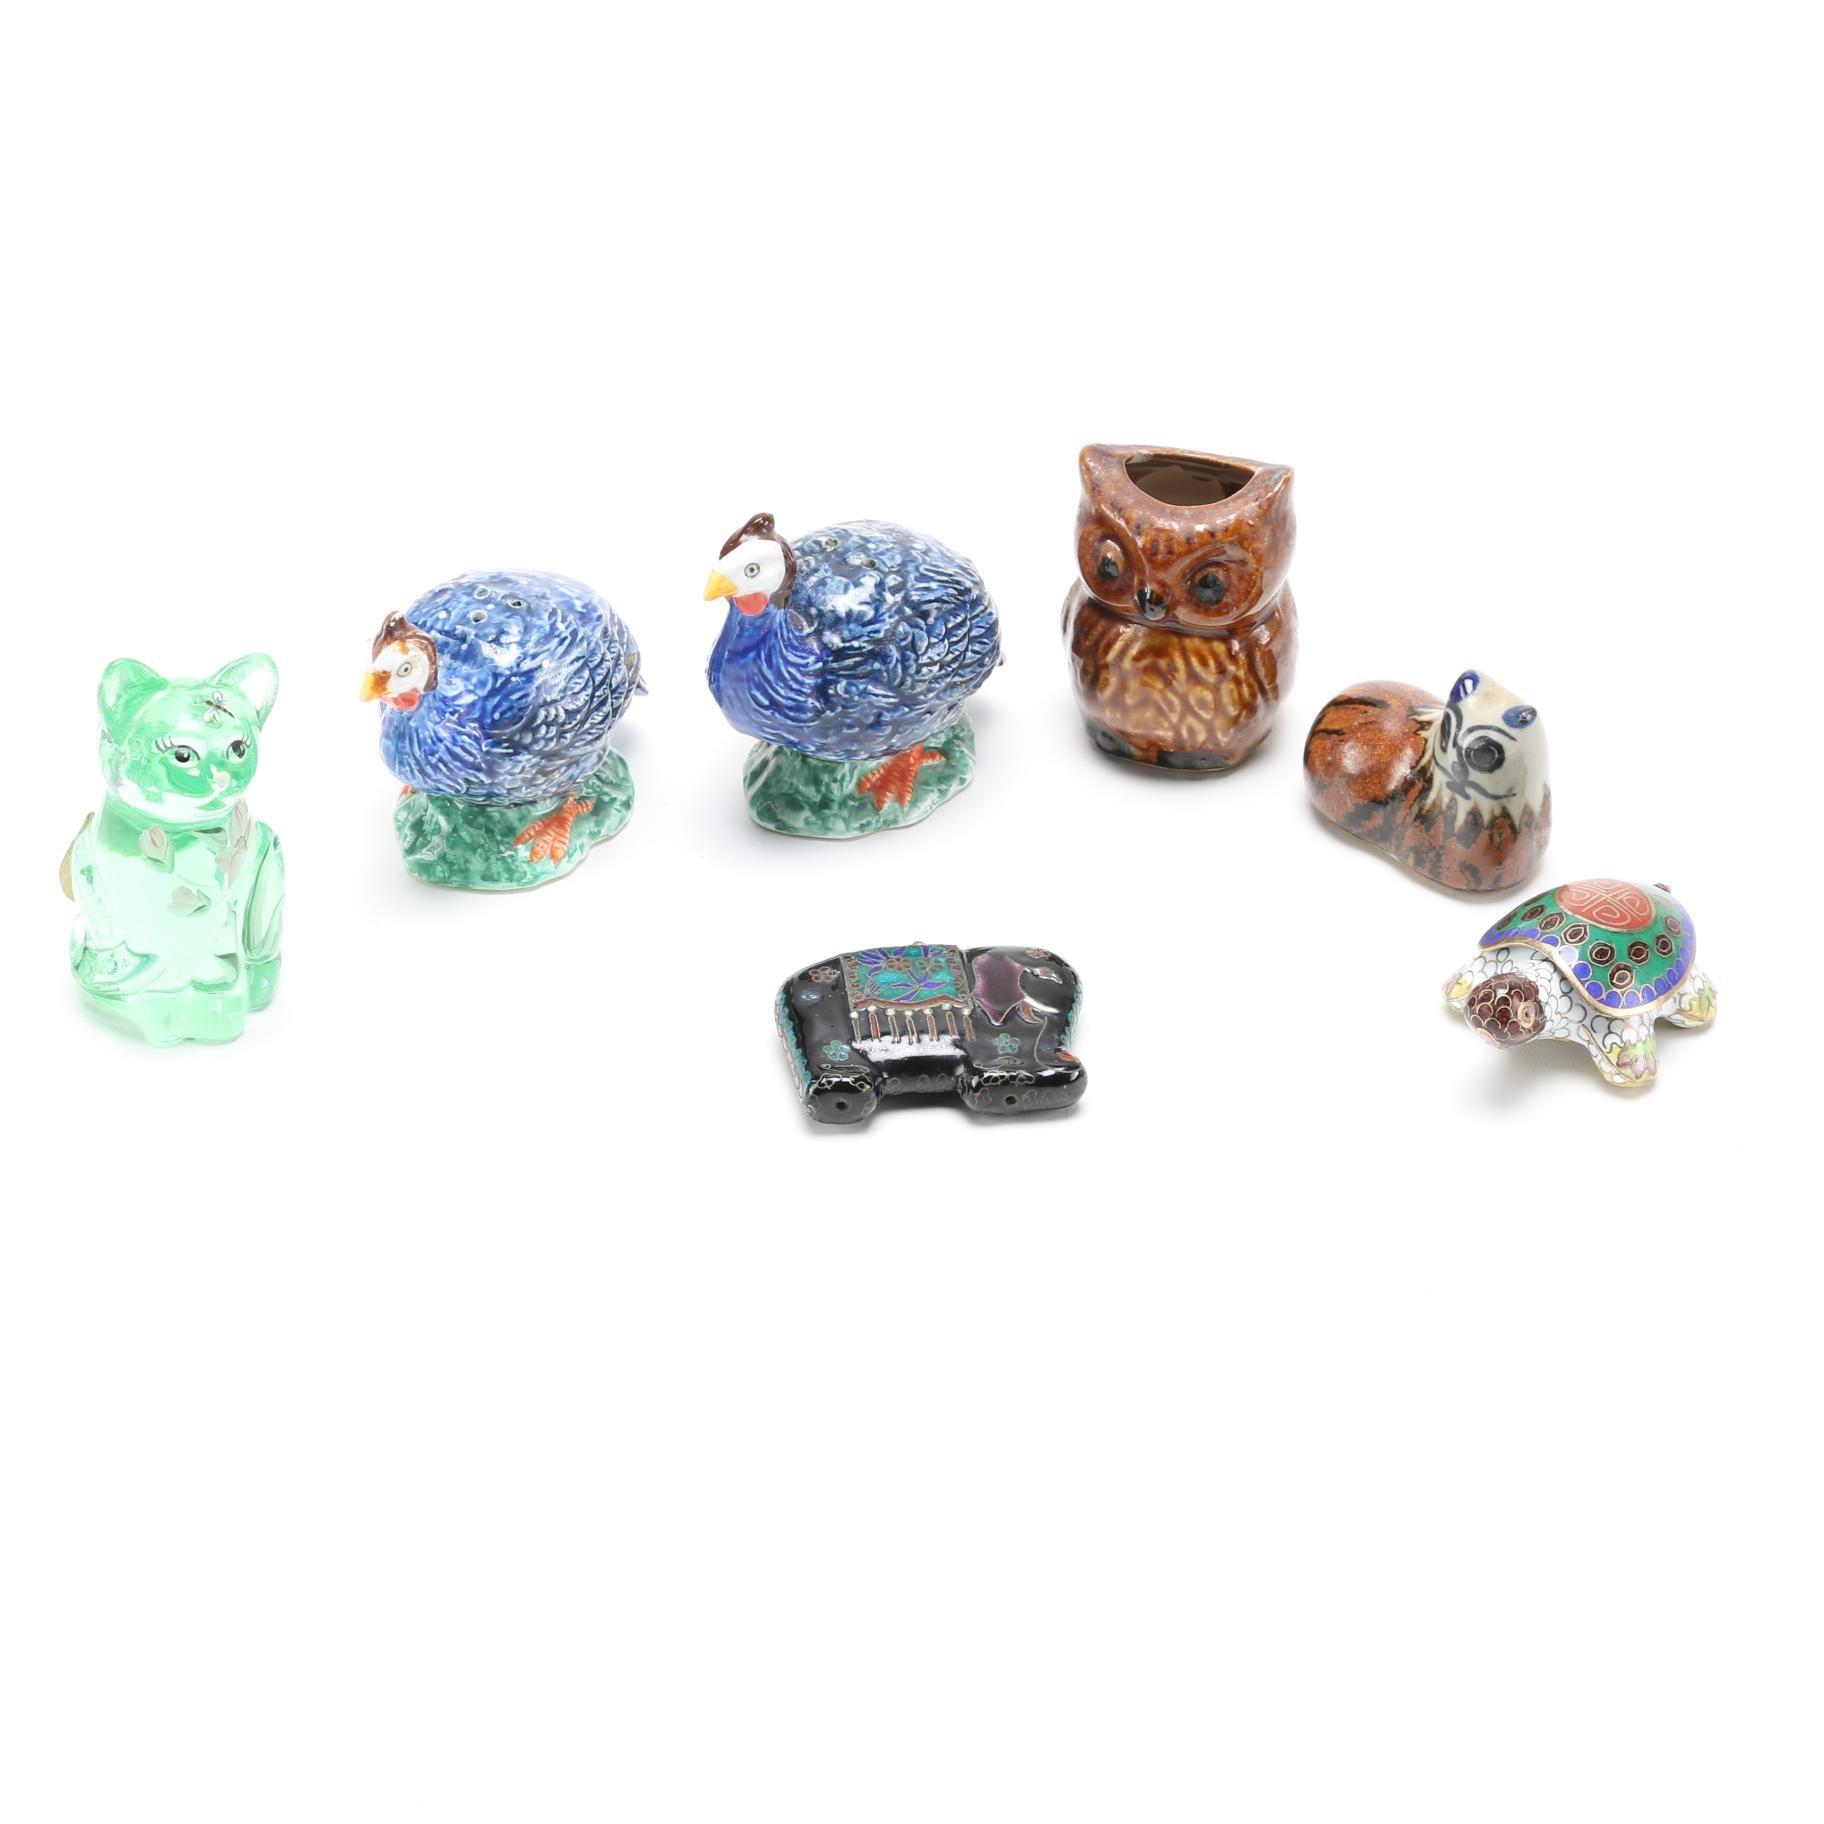 Animal Decor Assortment Featuring Fenton Glass